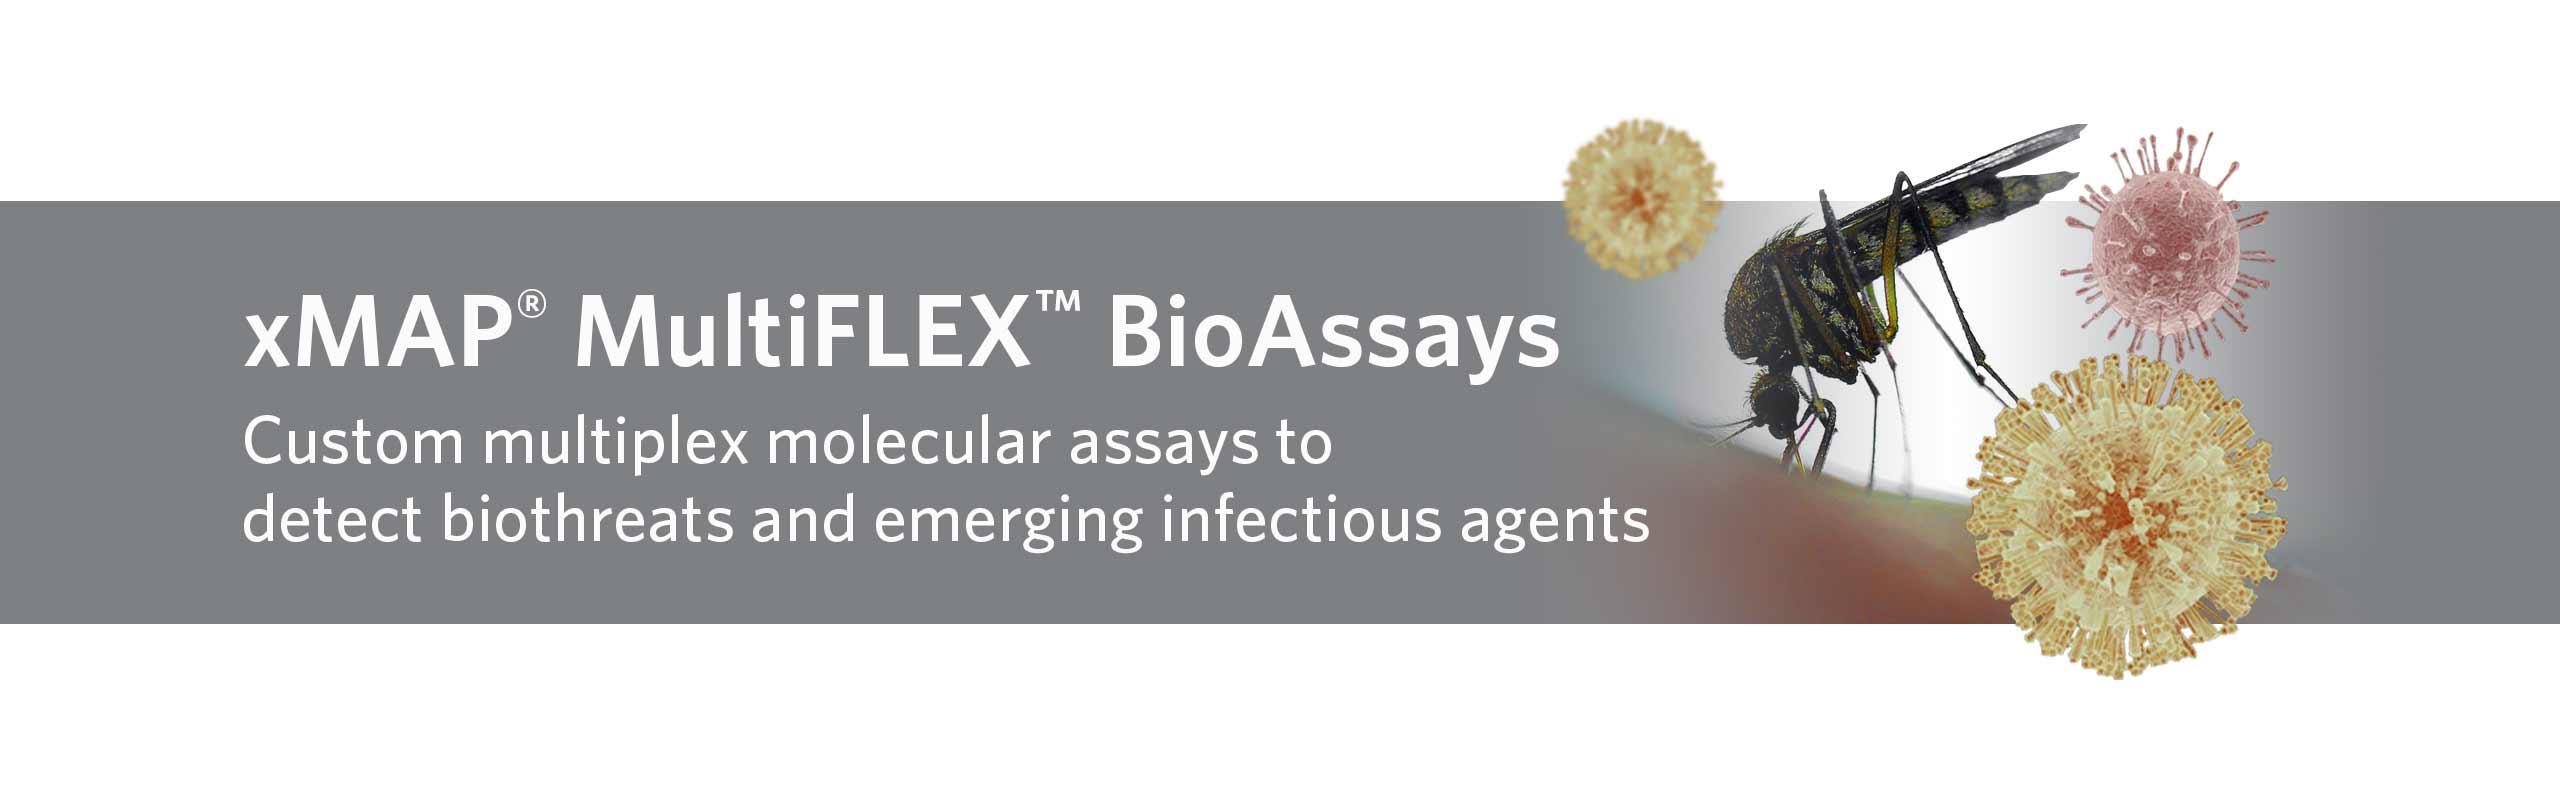 xMAP MultiFLEX BioAssays RUO